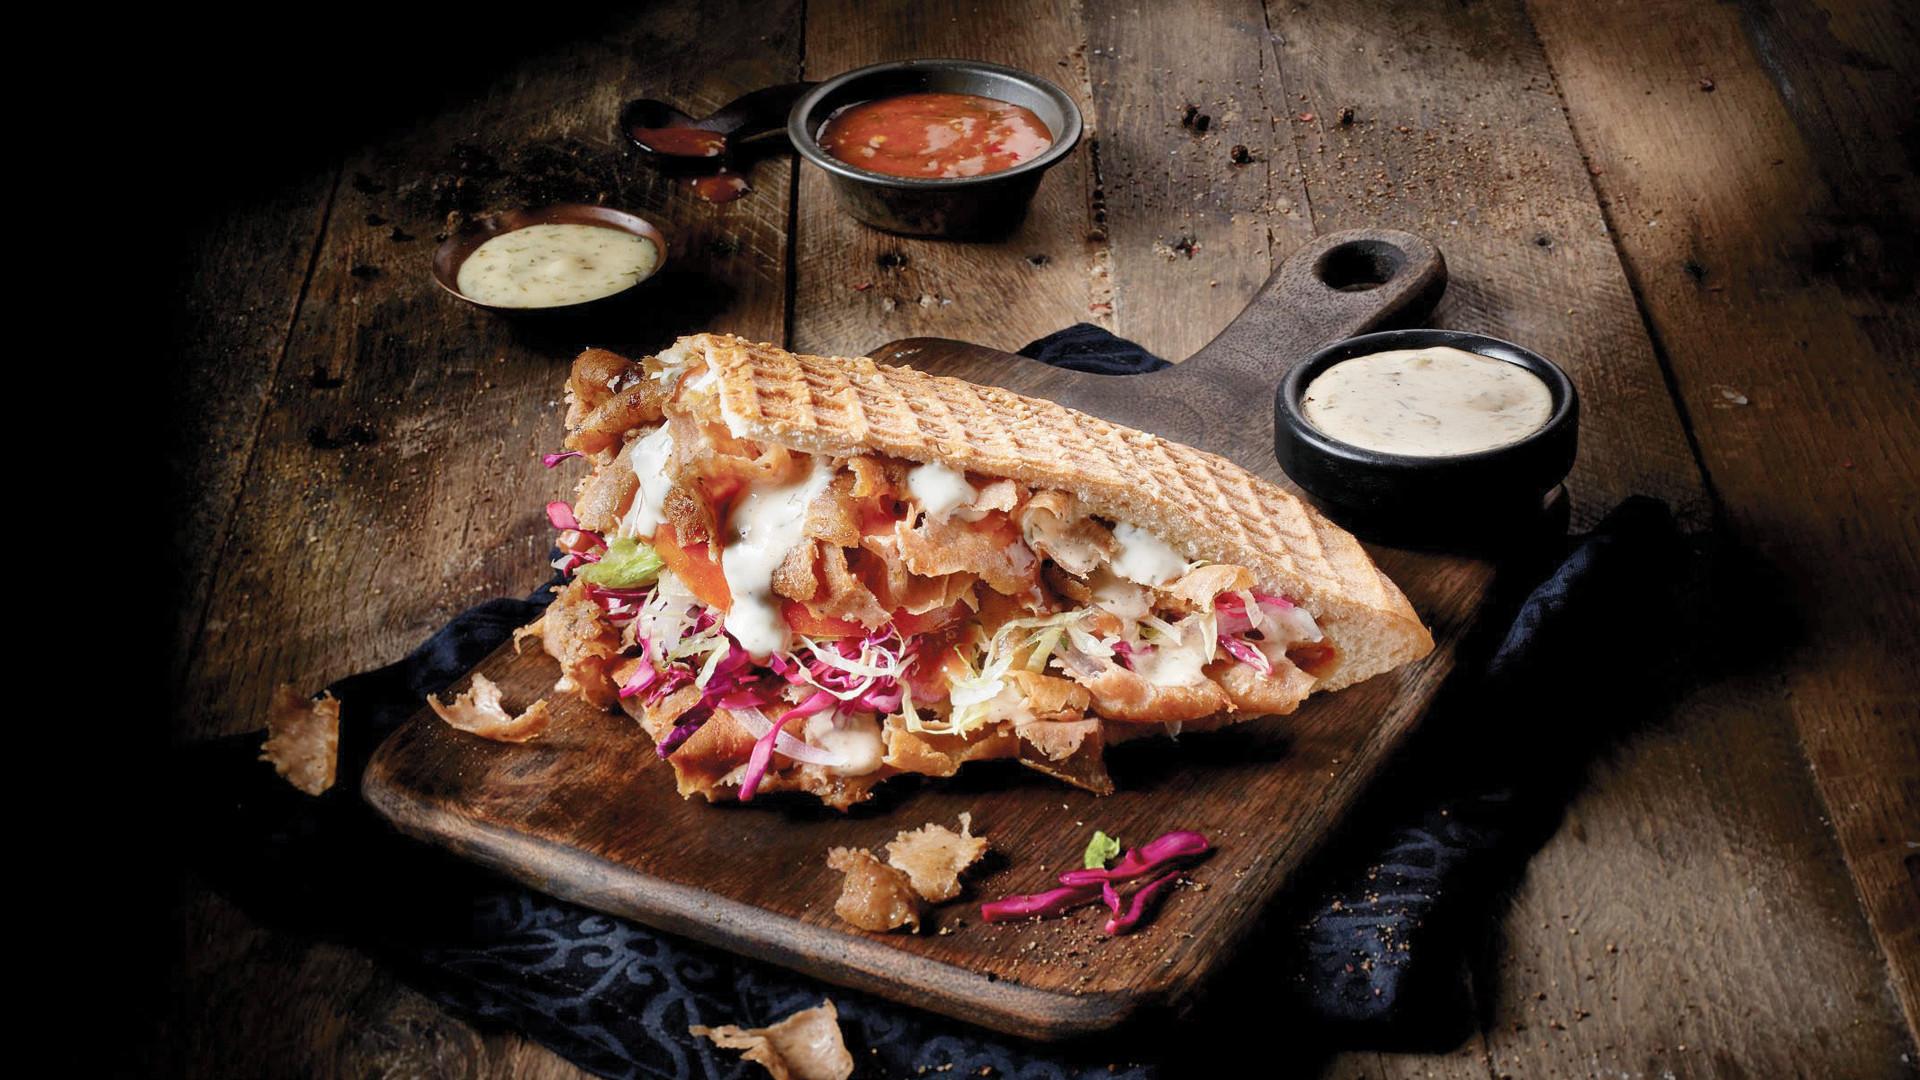 The best new restaurants in Toronto | A German Doner Kebab